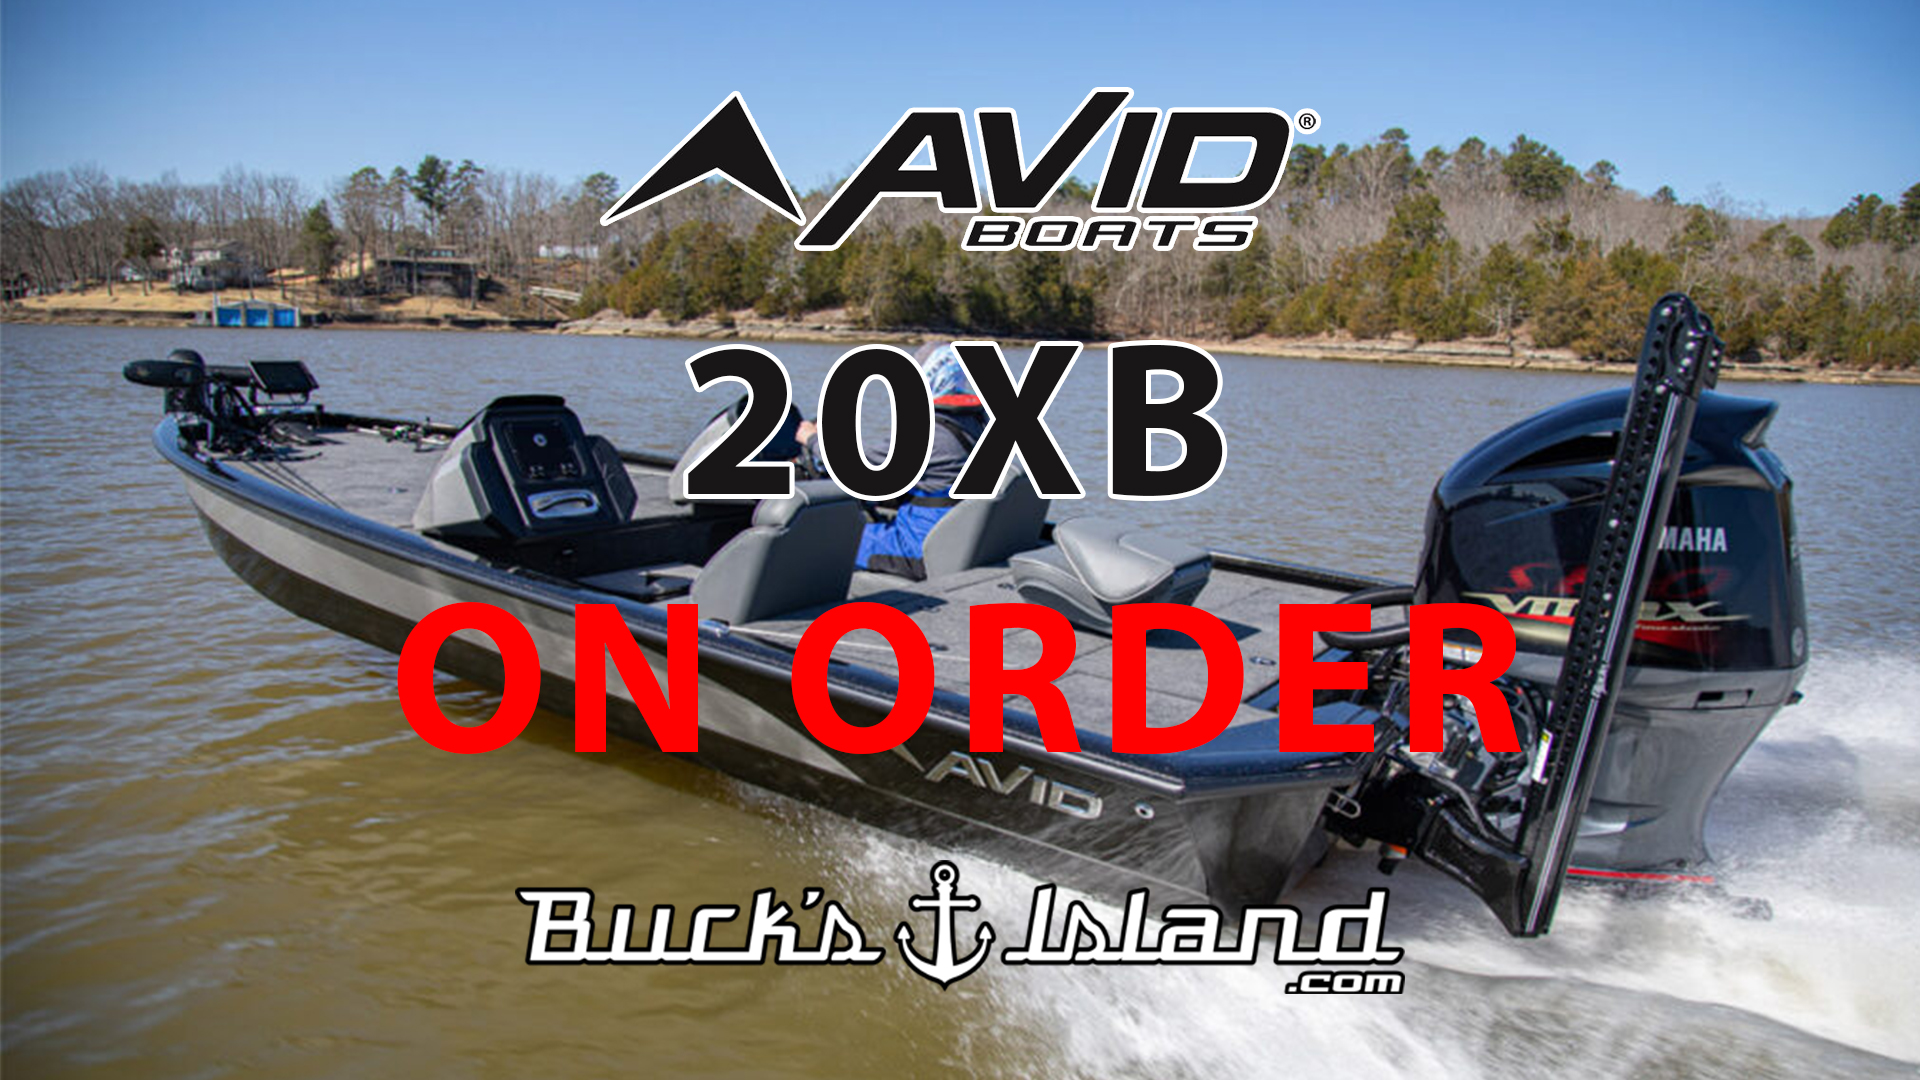 2021 Avid 20XB ON ORDER thumbnail